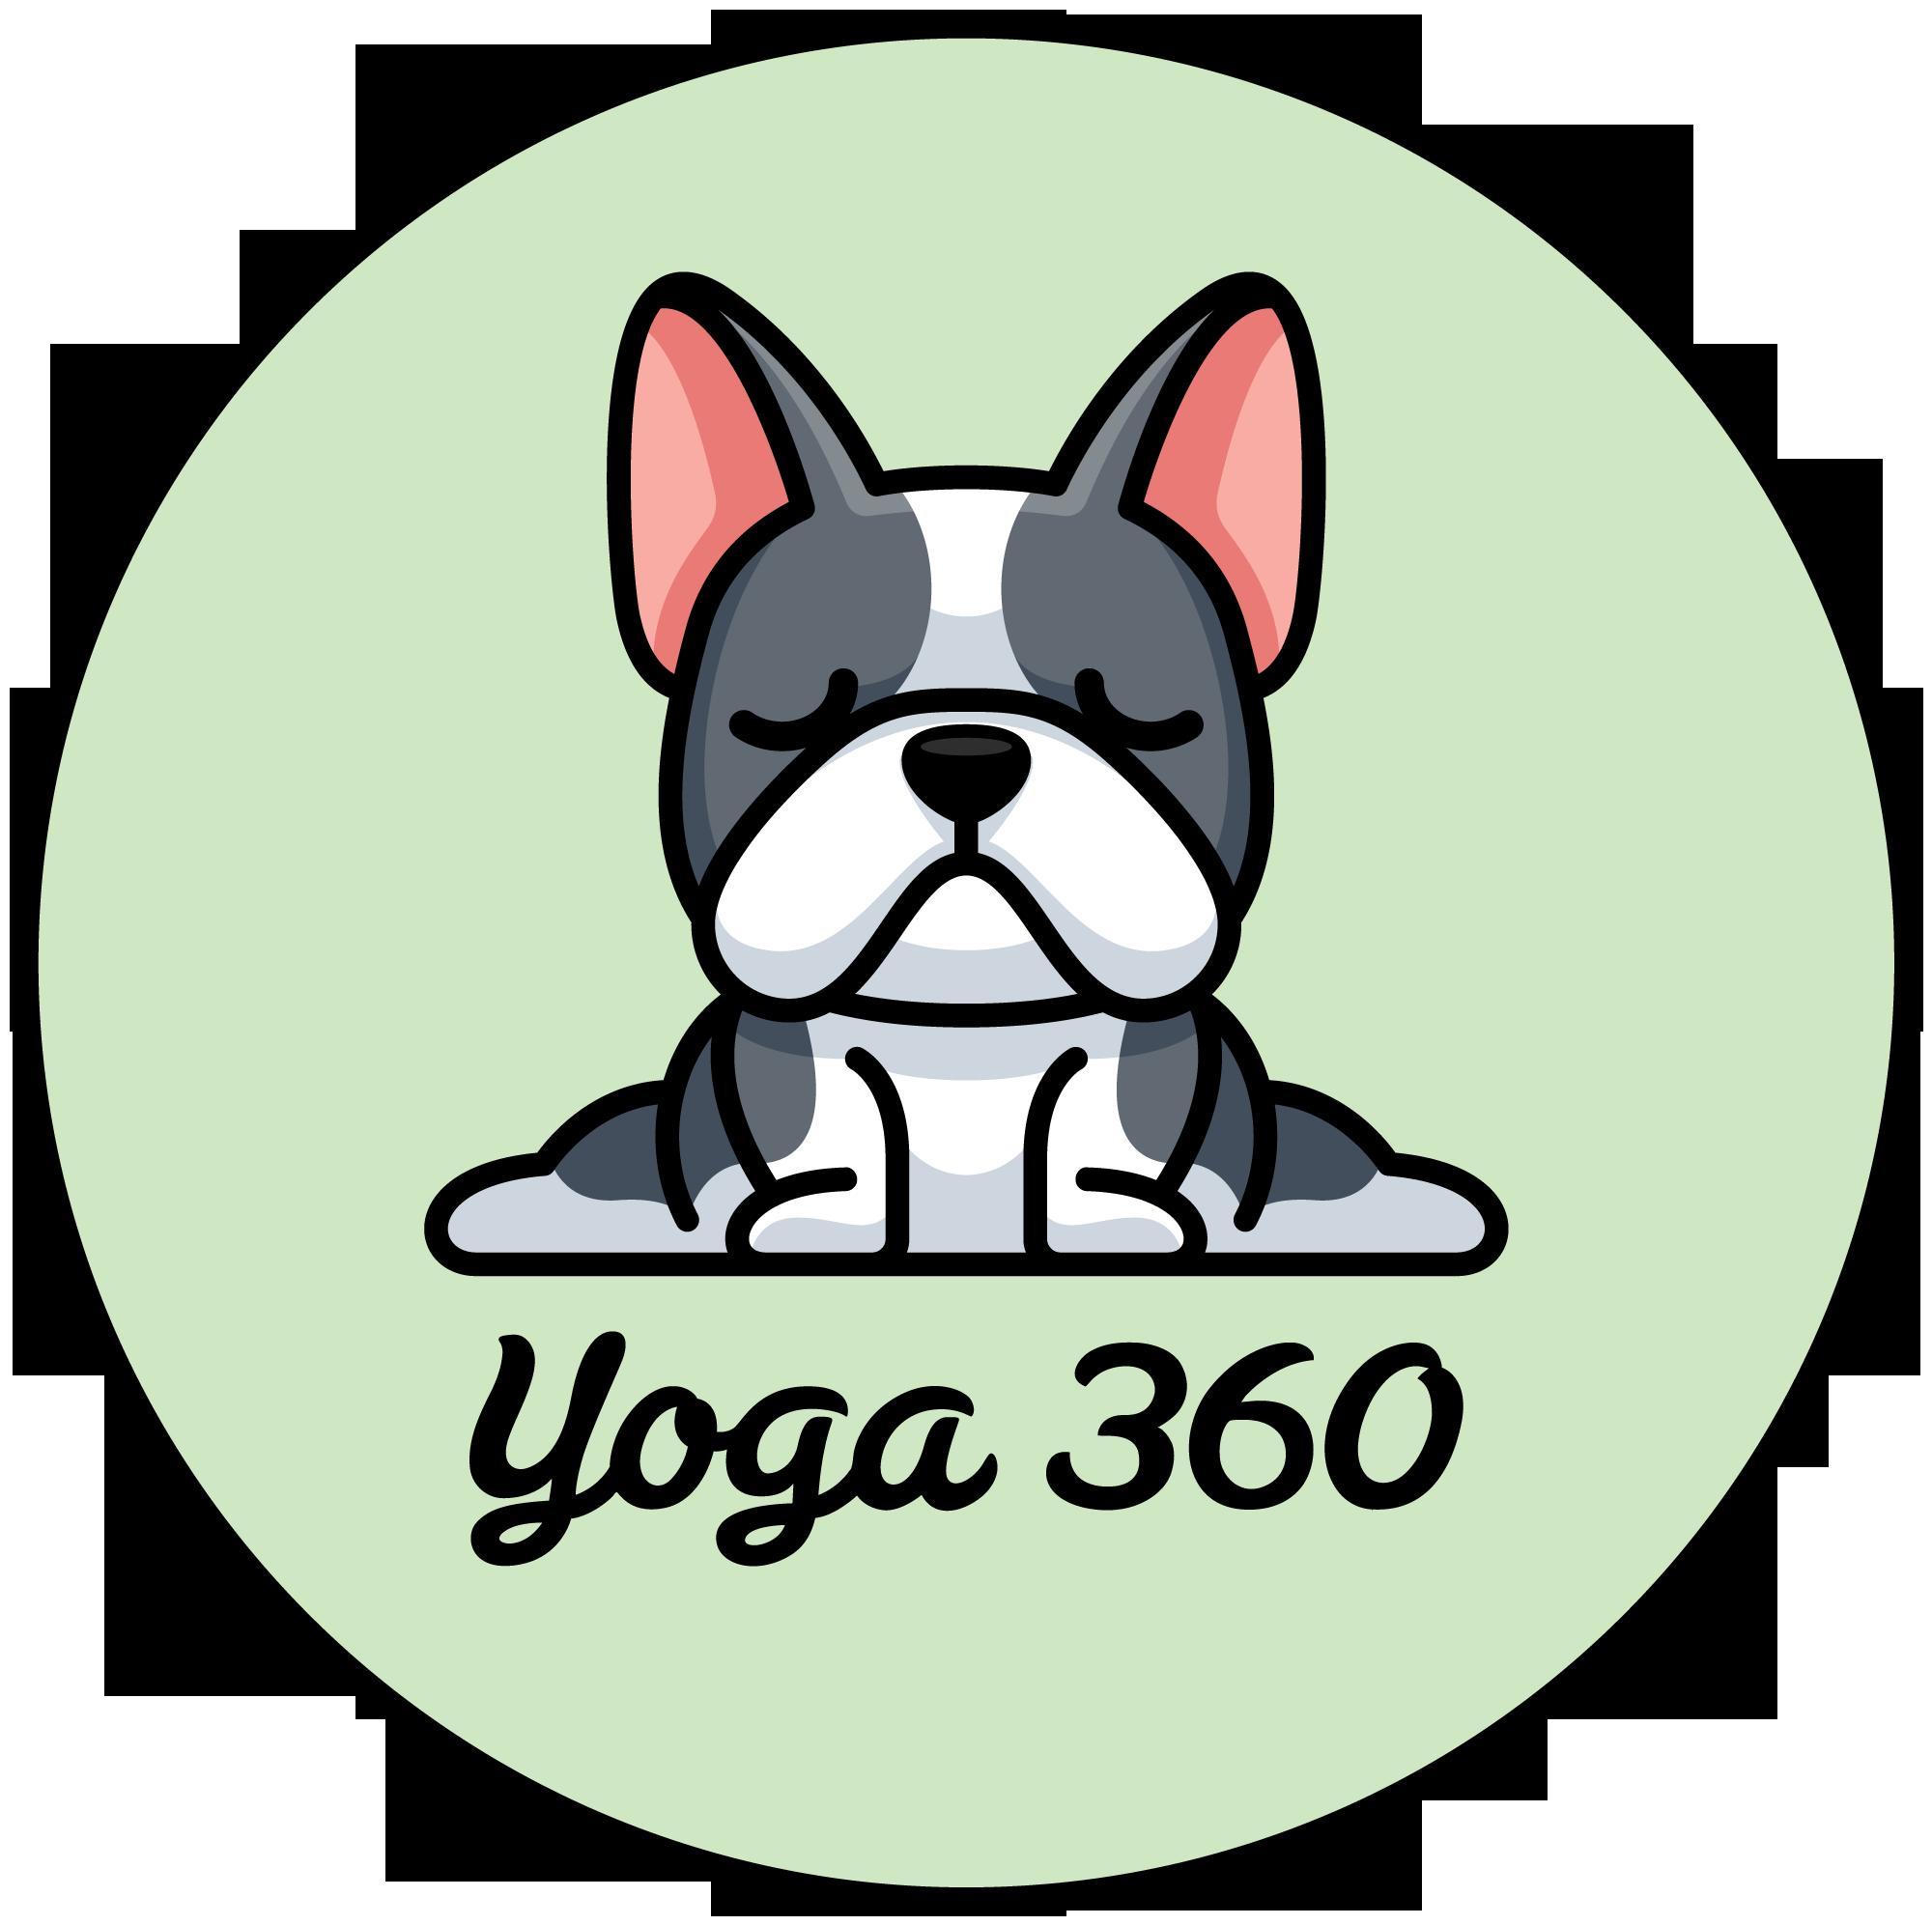 Yoga 360